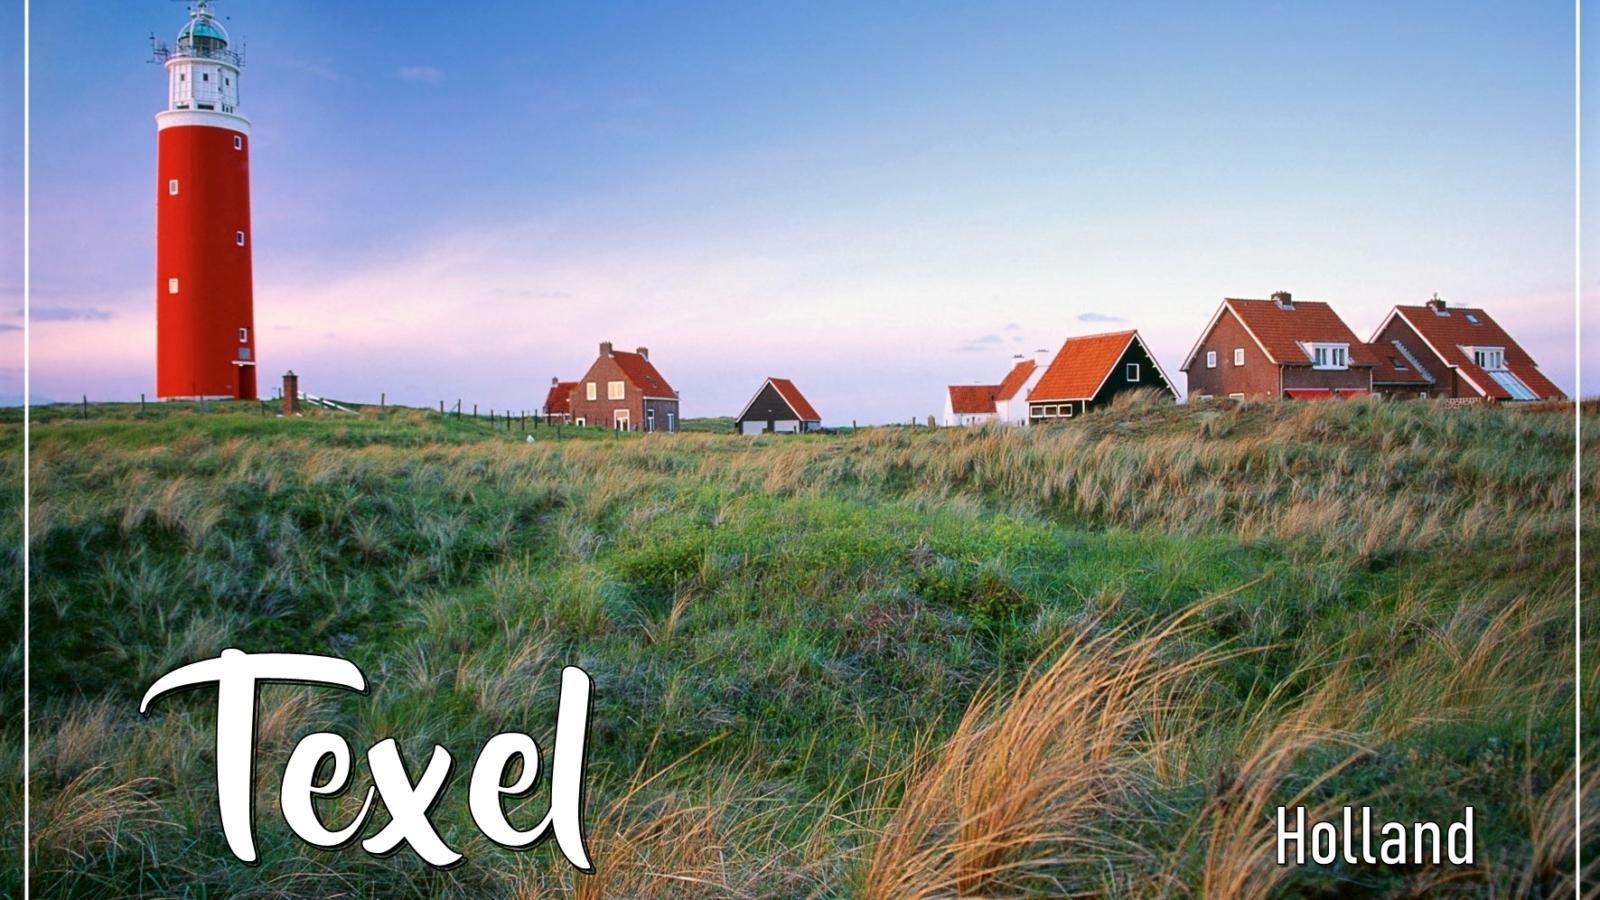 Texel, l'isola olandese della quiete